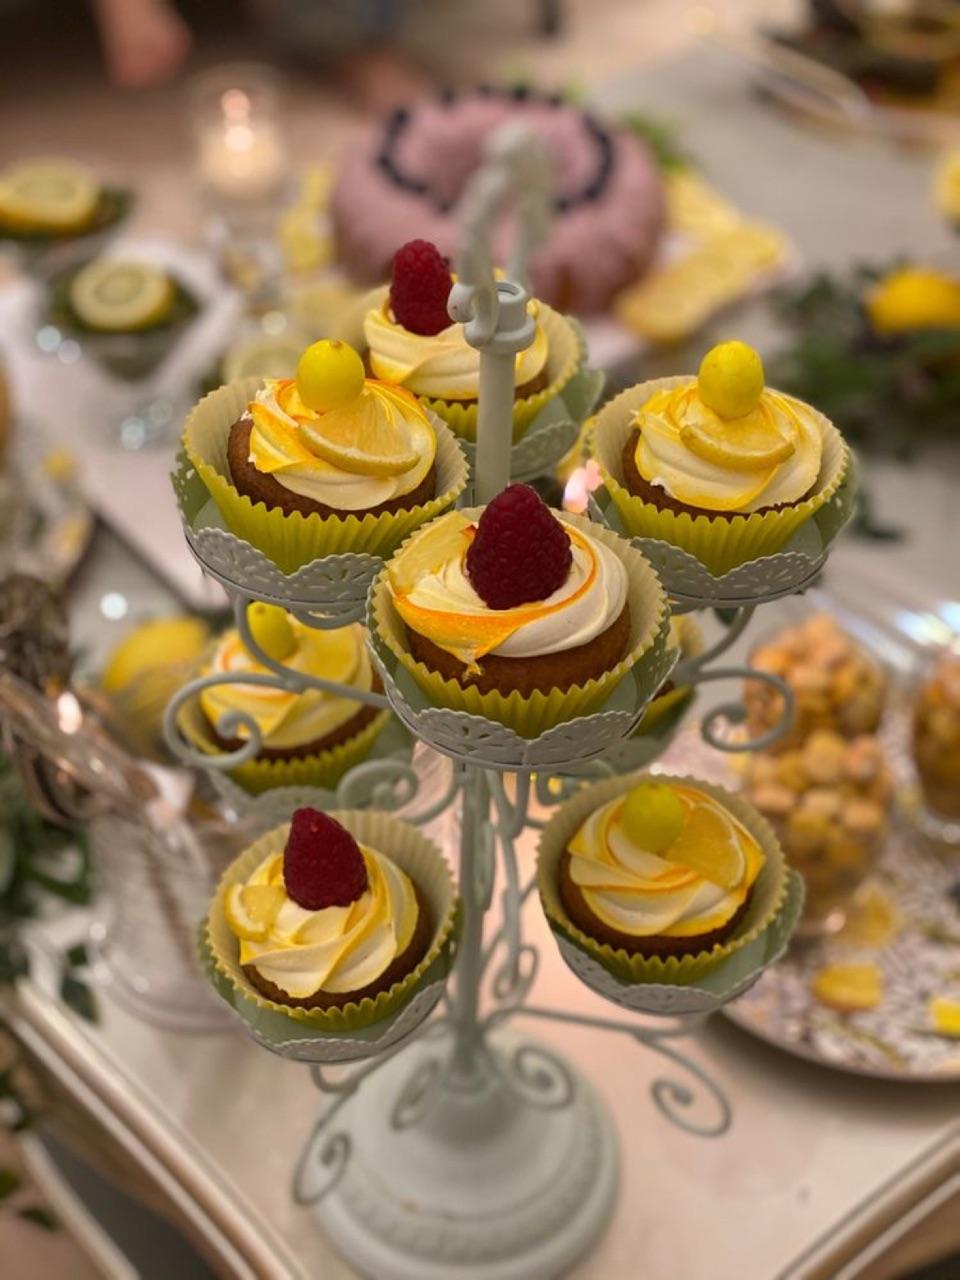 FRUiTS, raspberry, and baking image